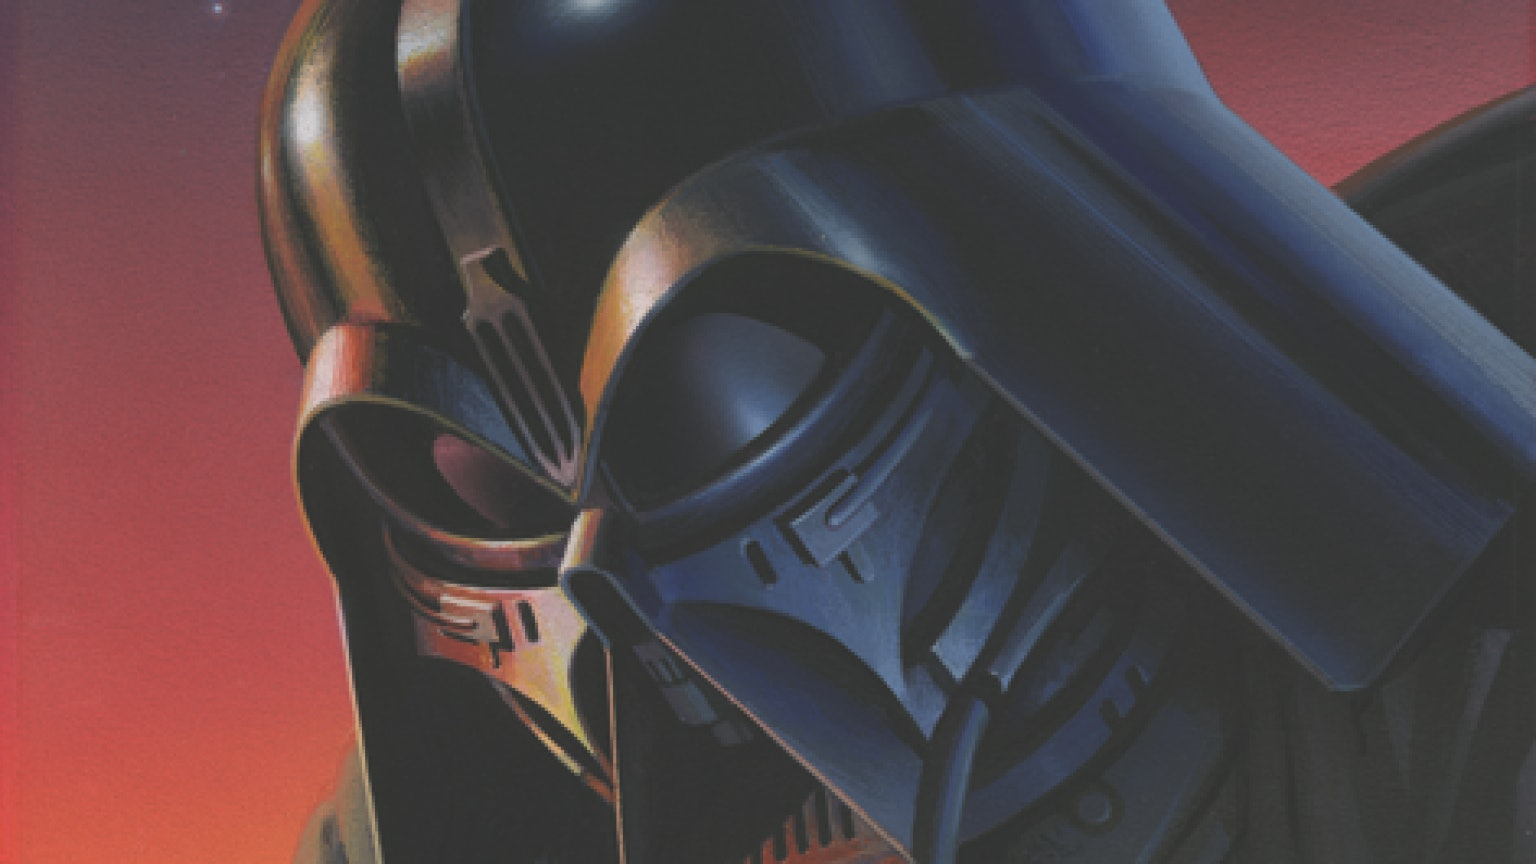 Early Darth Vader concept art